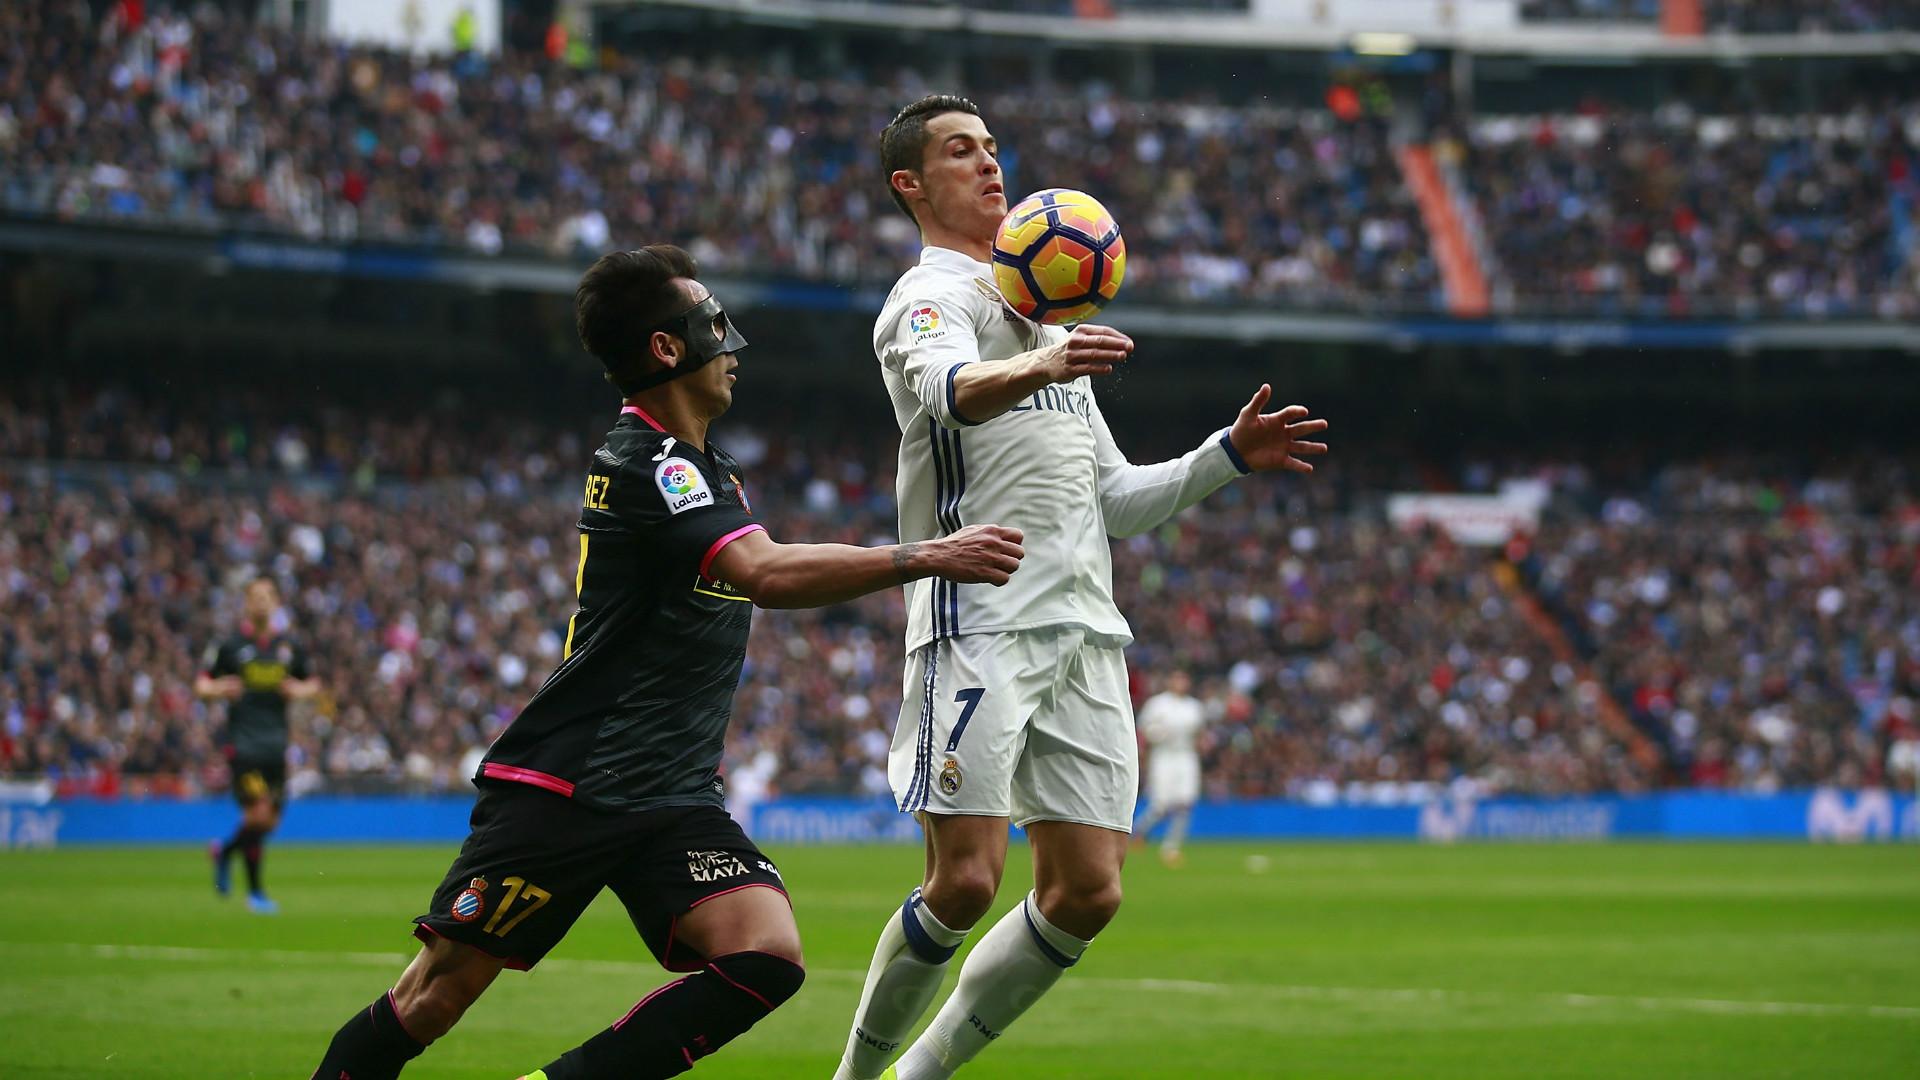 Cristiano Ronaldo Hernan Perez Real Madrid Espanyol LaLiga